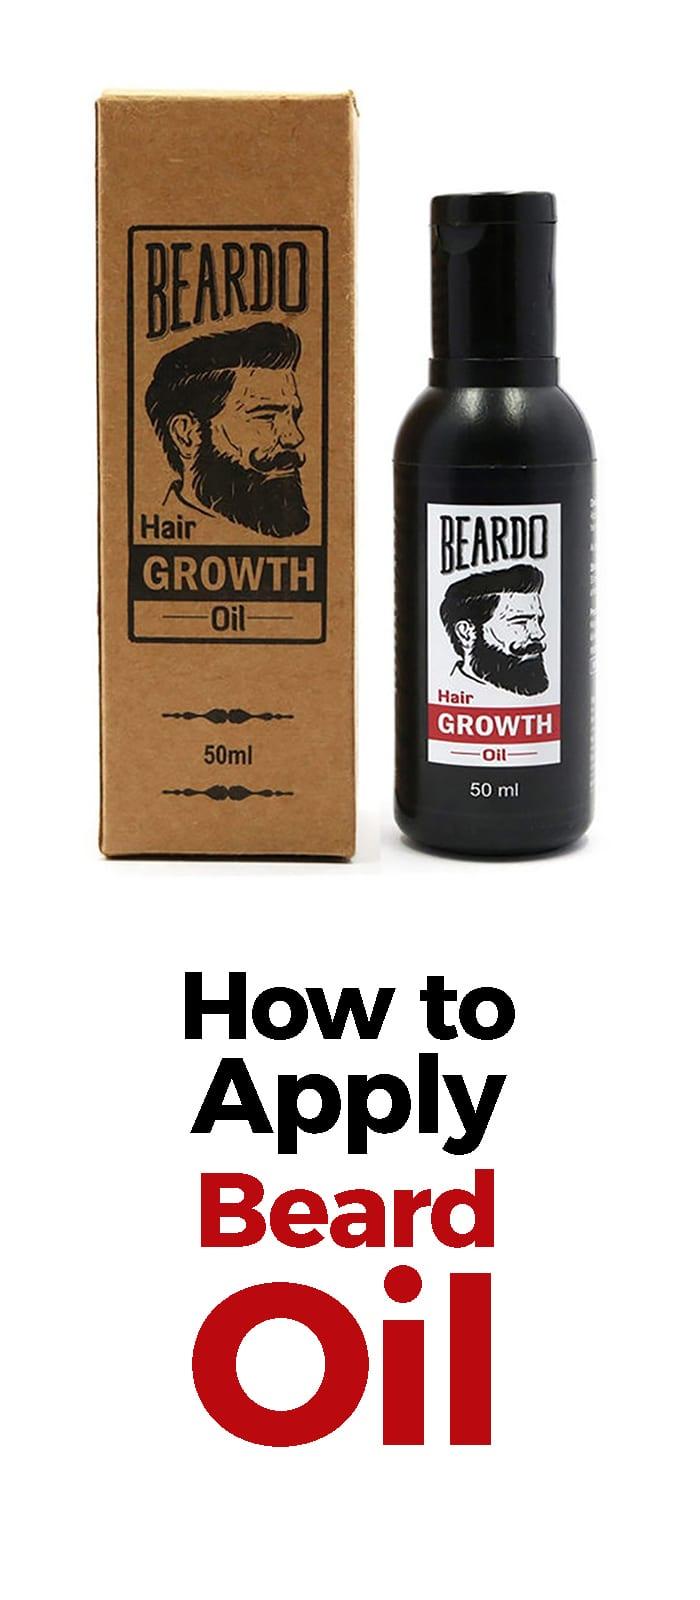 How To Apply Beard Oil!